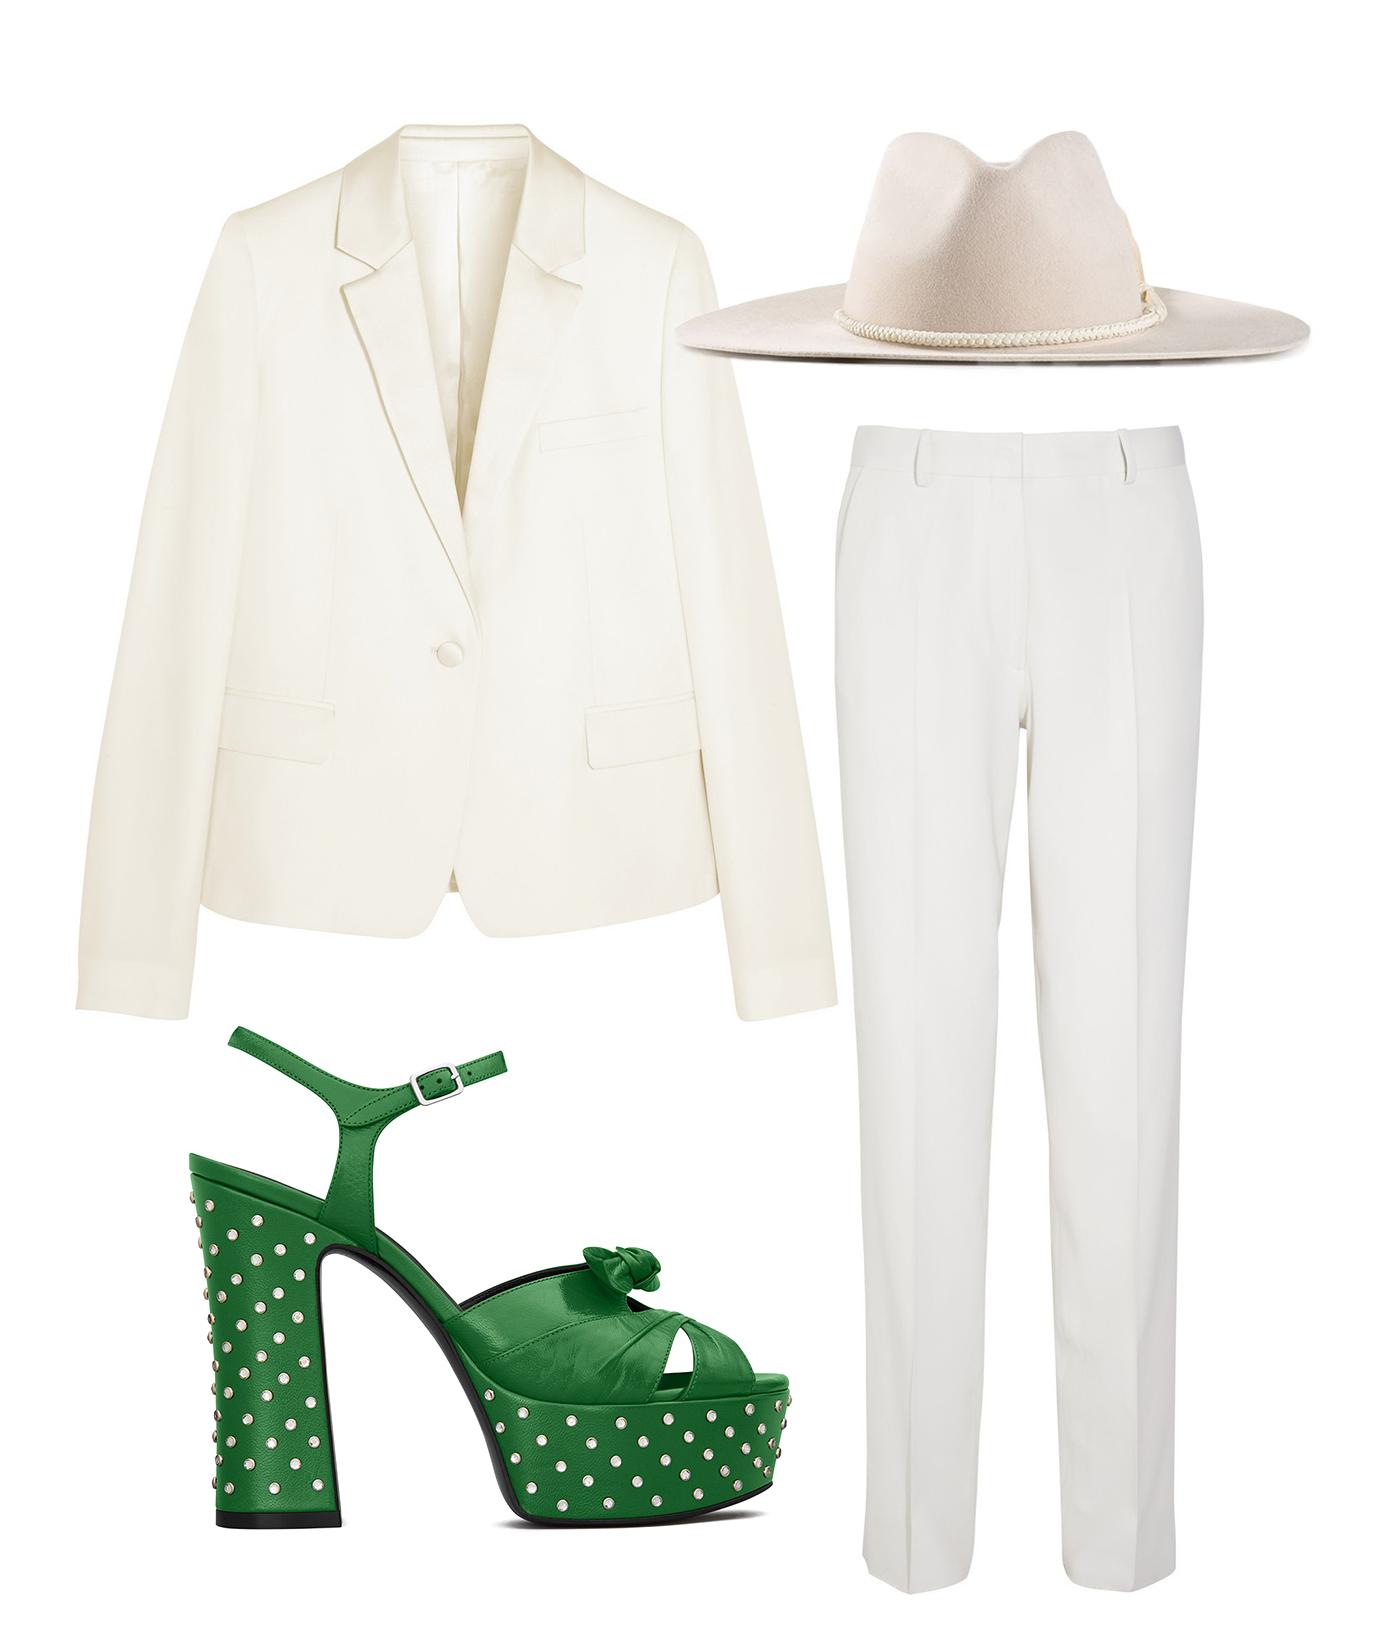 spring-wedding-dresses-accessories-02.jpg